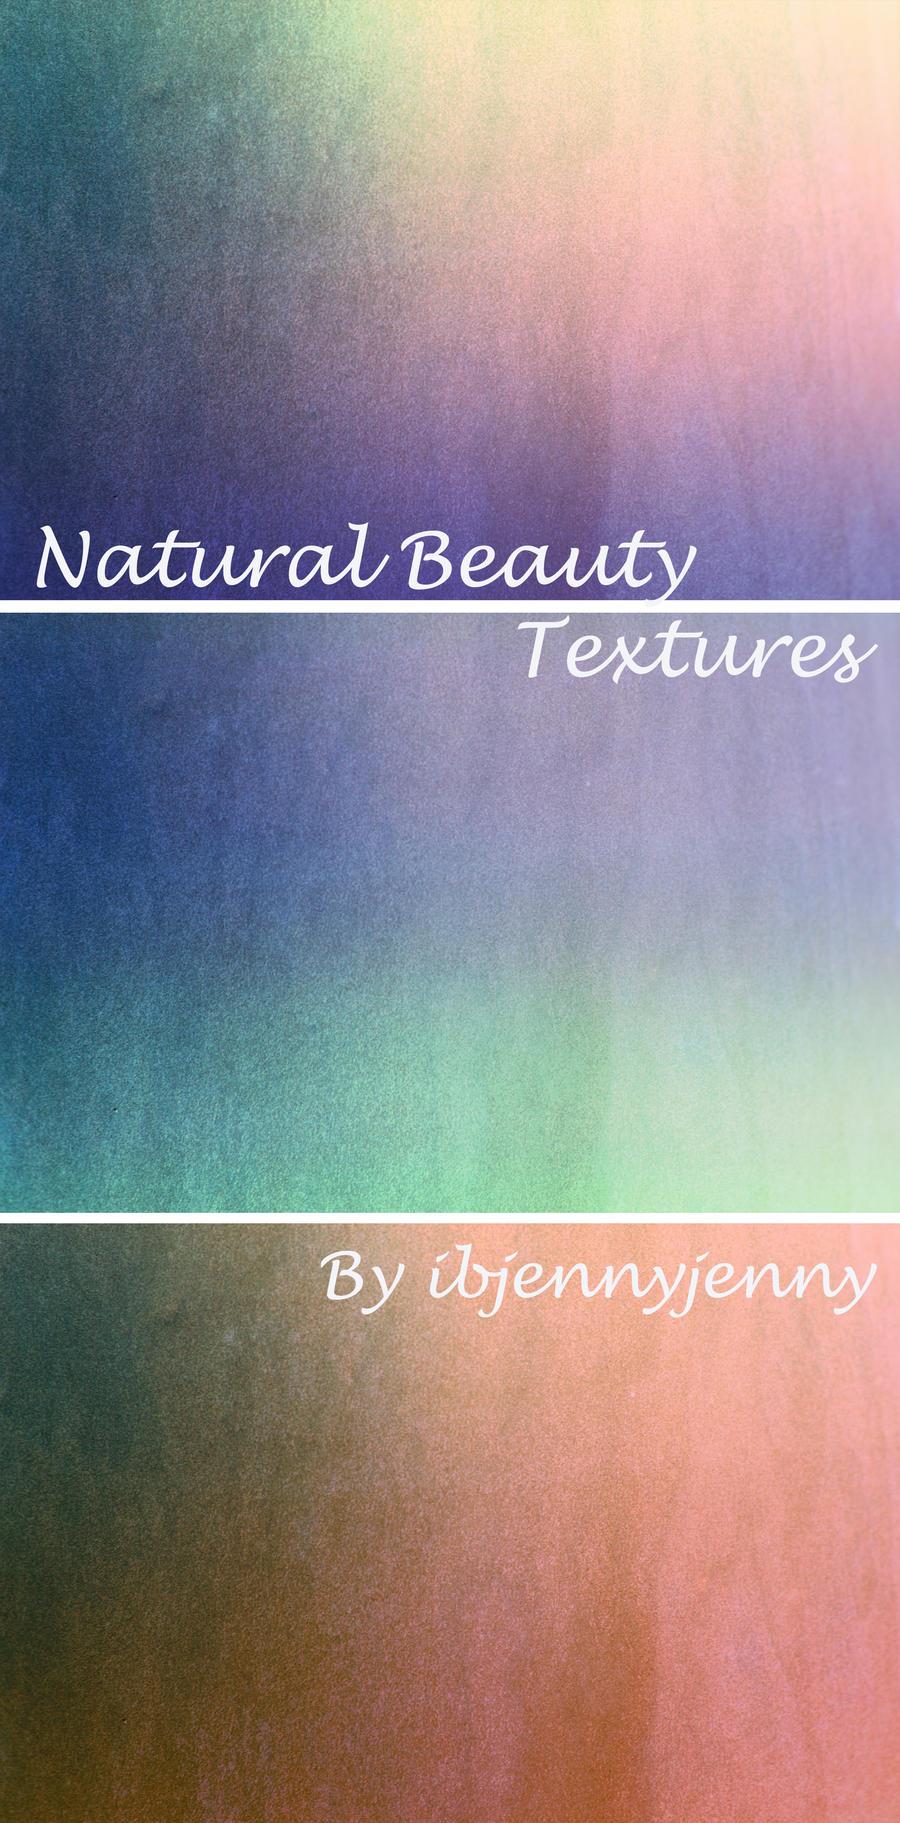 Natural Beauty Textures